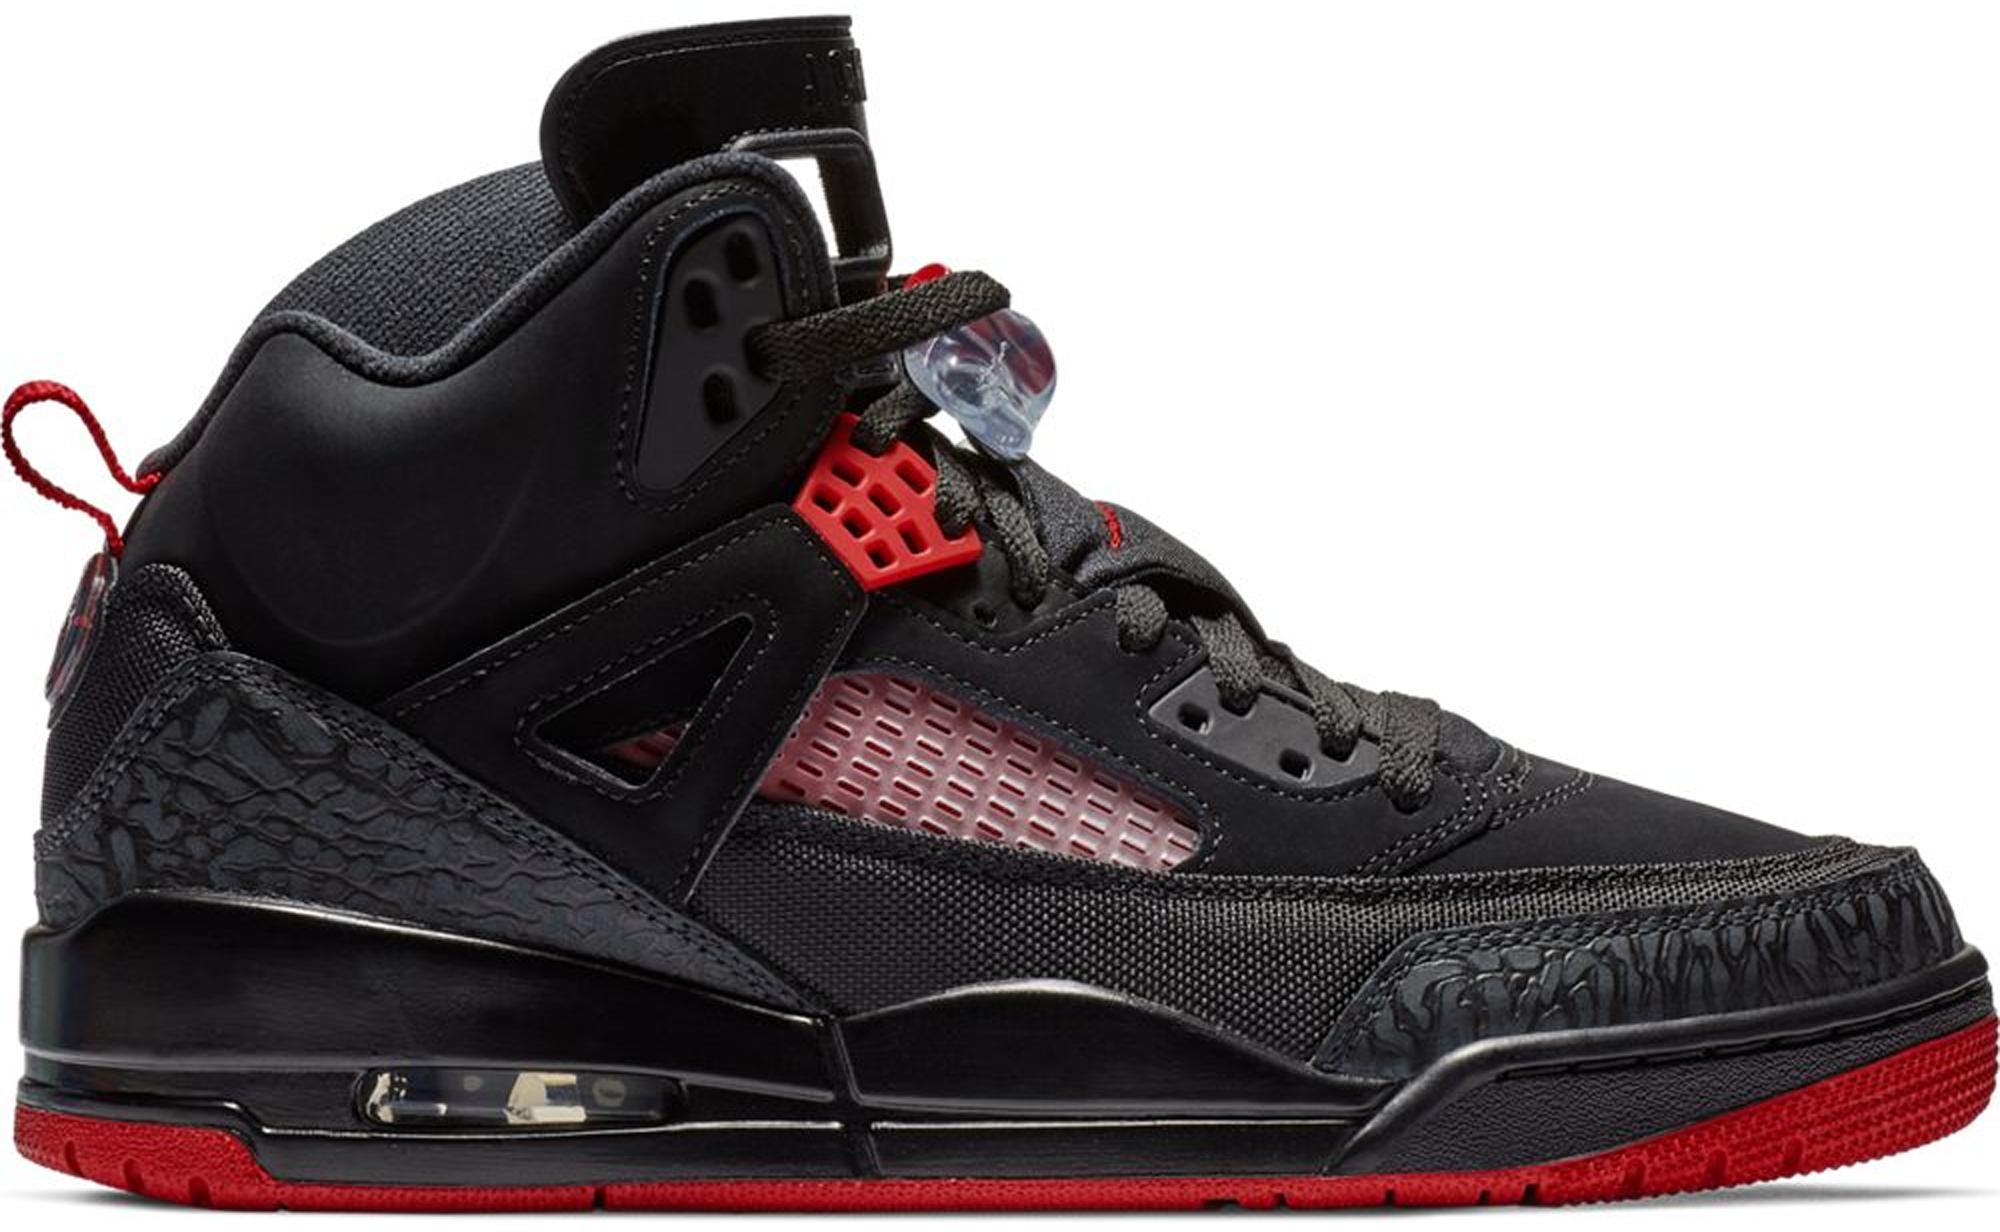 Jordan Spizike Black Gym Red